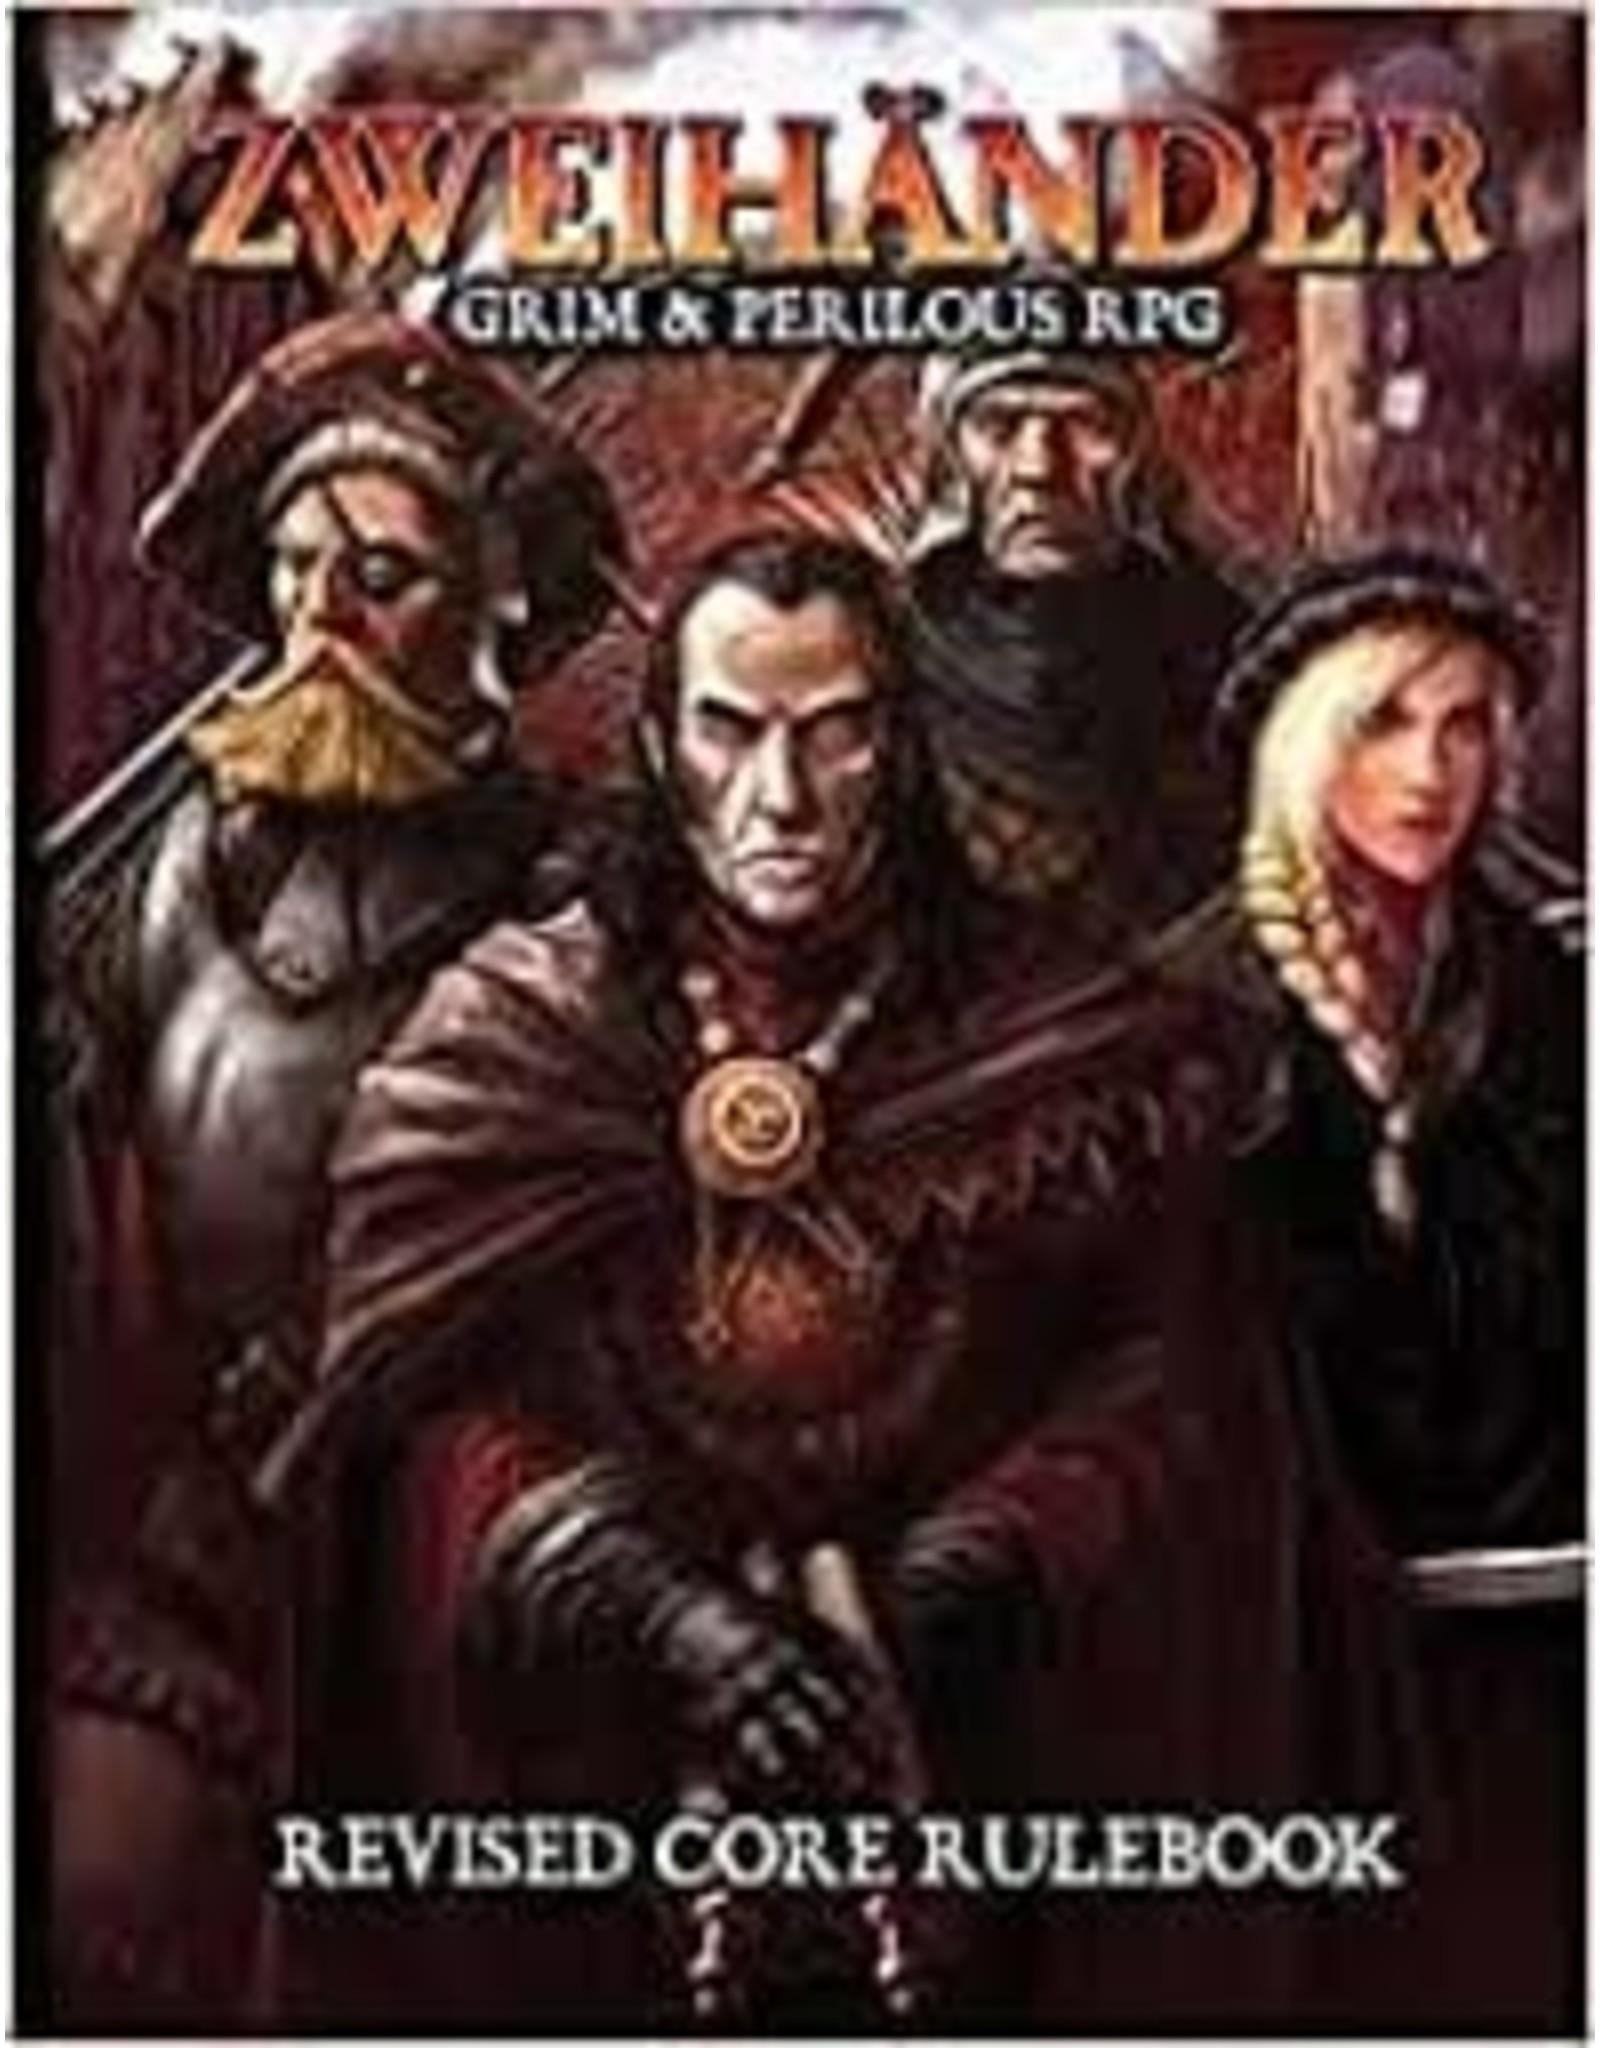 Amp Adult ZWEIHANDER: Grim & Perilous RPG Corebook